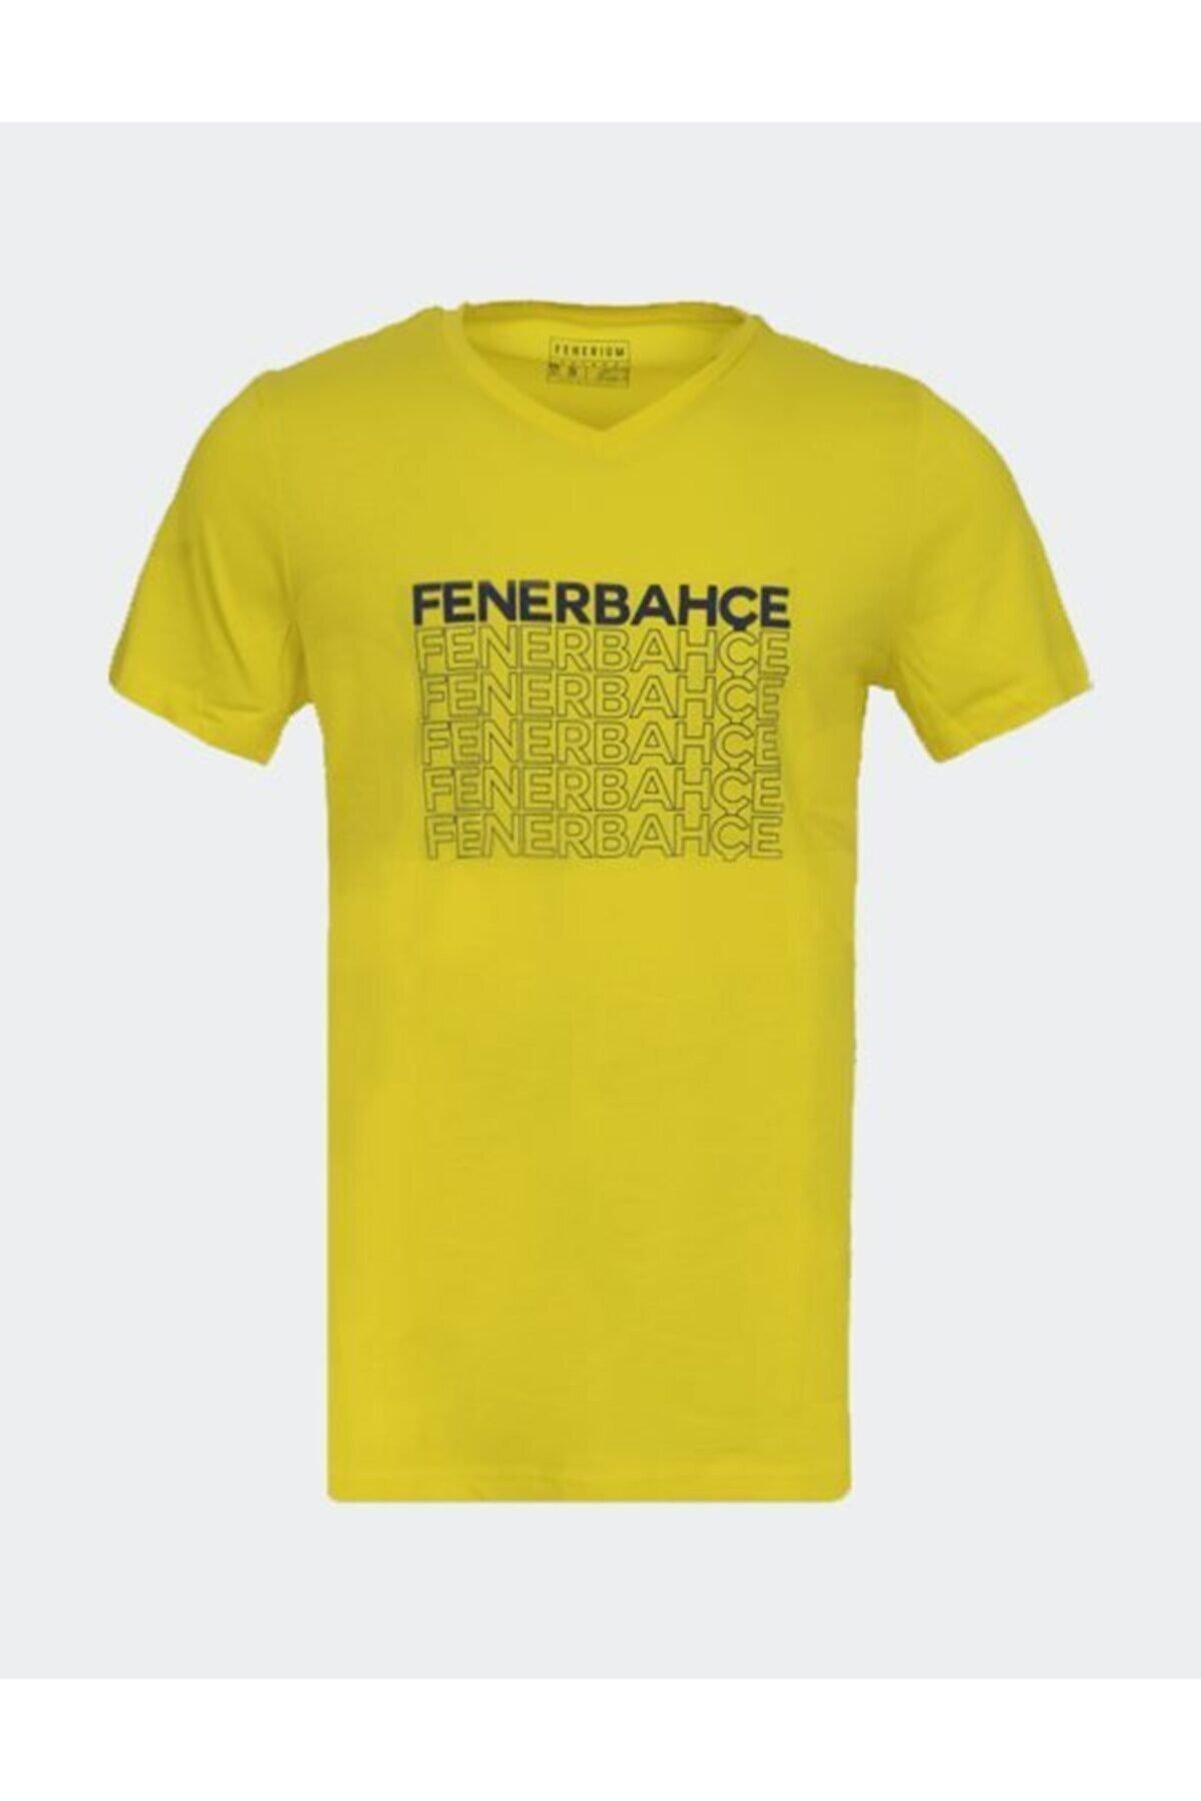 Fenerbahçe Erkek Trıbun Flok Fb Tshırt